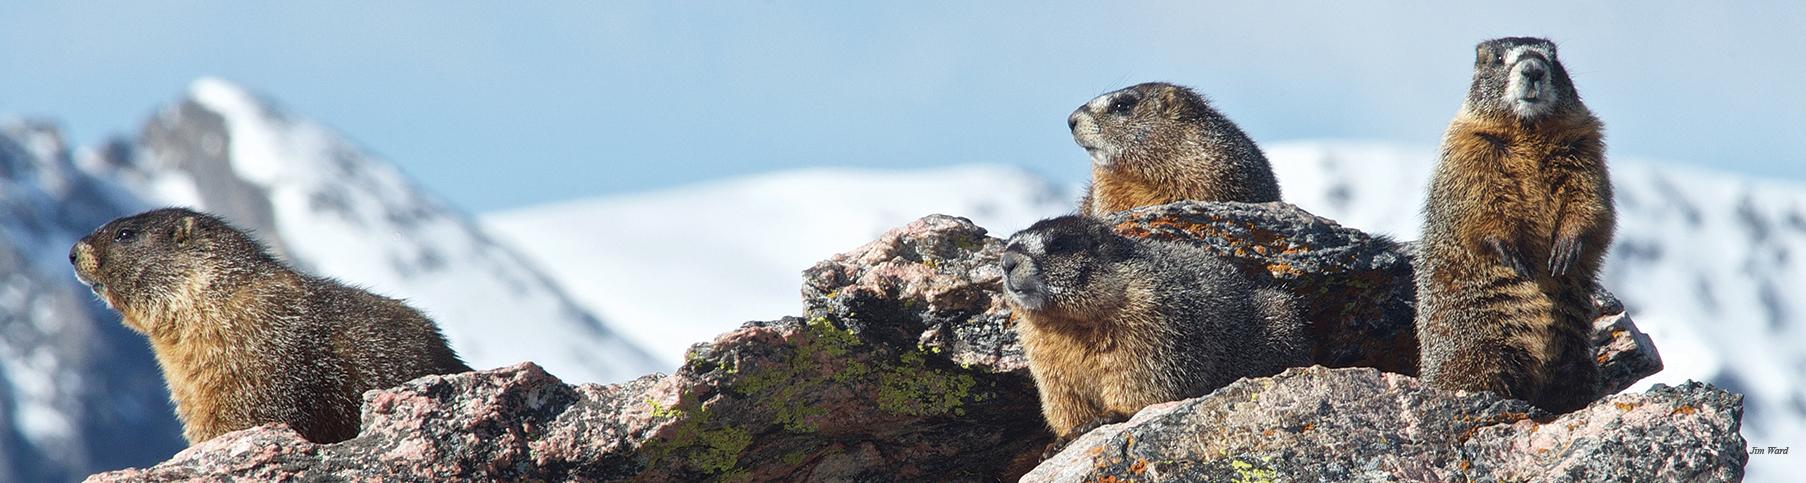 TRR Marmots JWard